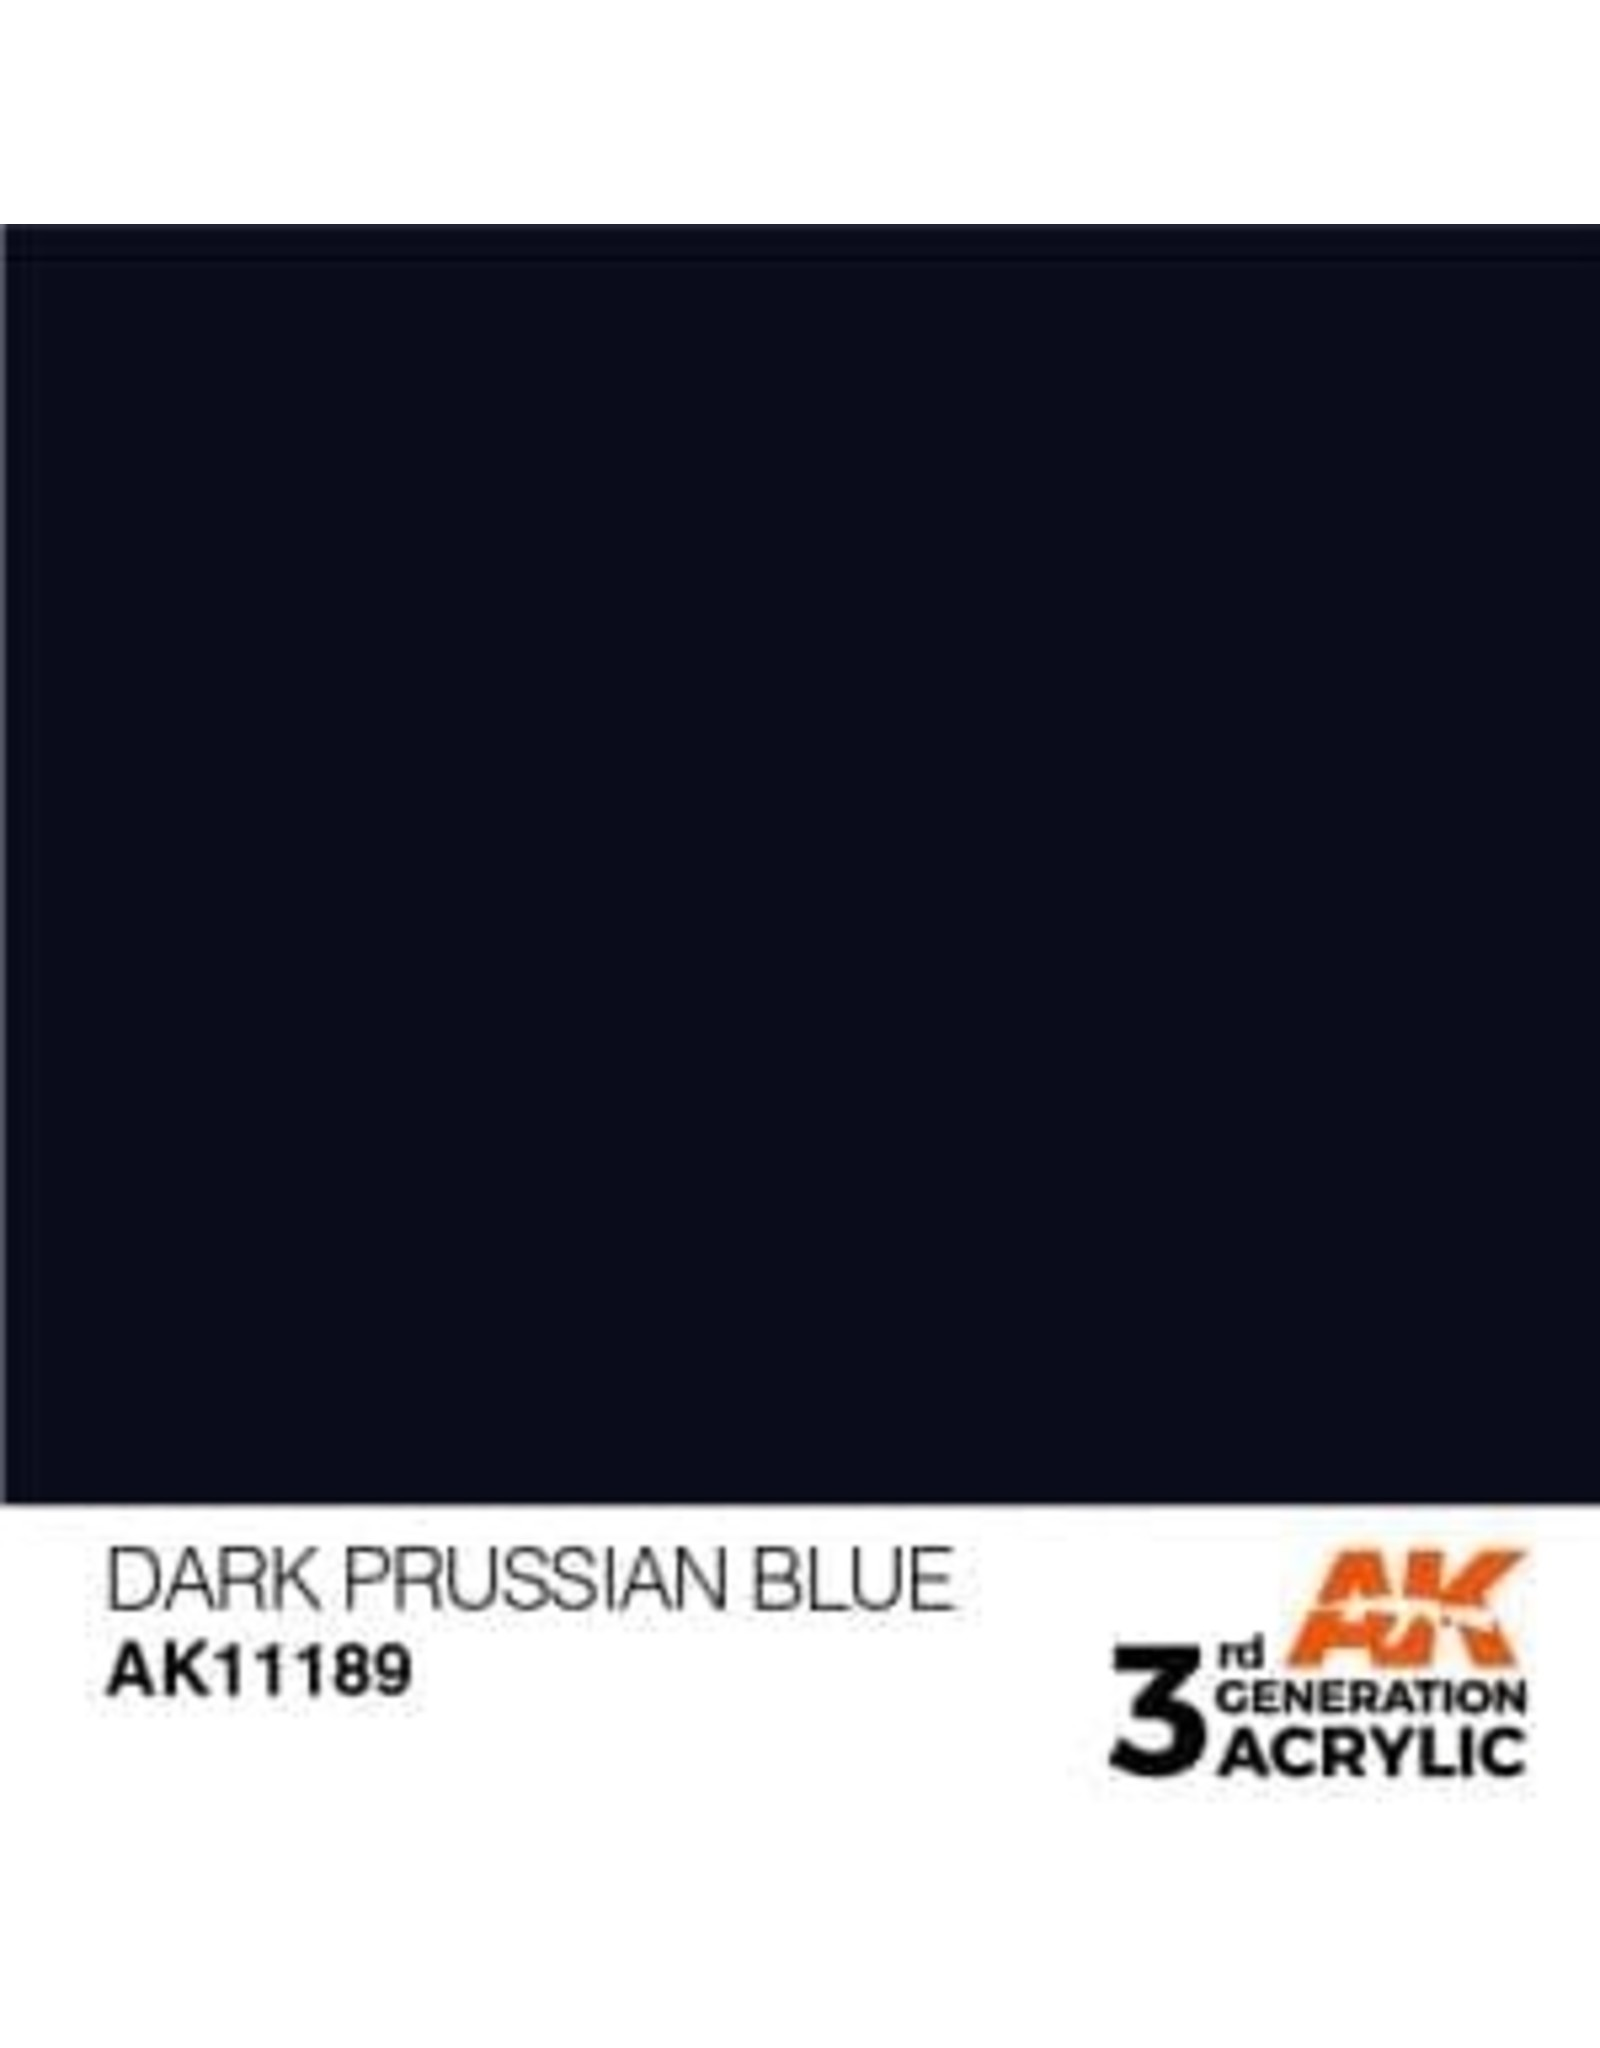 AK Interactive 3RD GEN ACRYLIC DARK PRUSSIAN BLUE 17ML